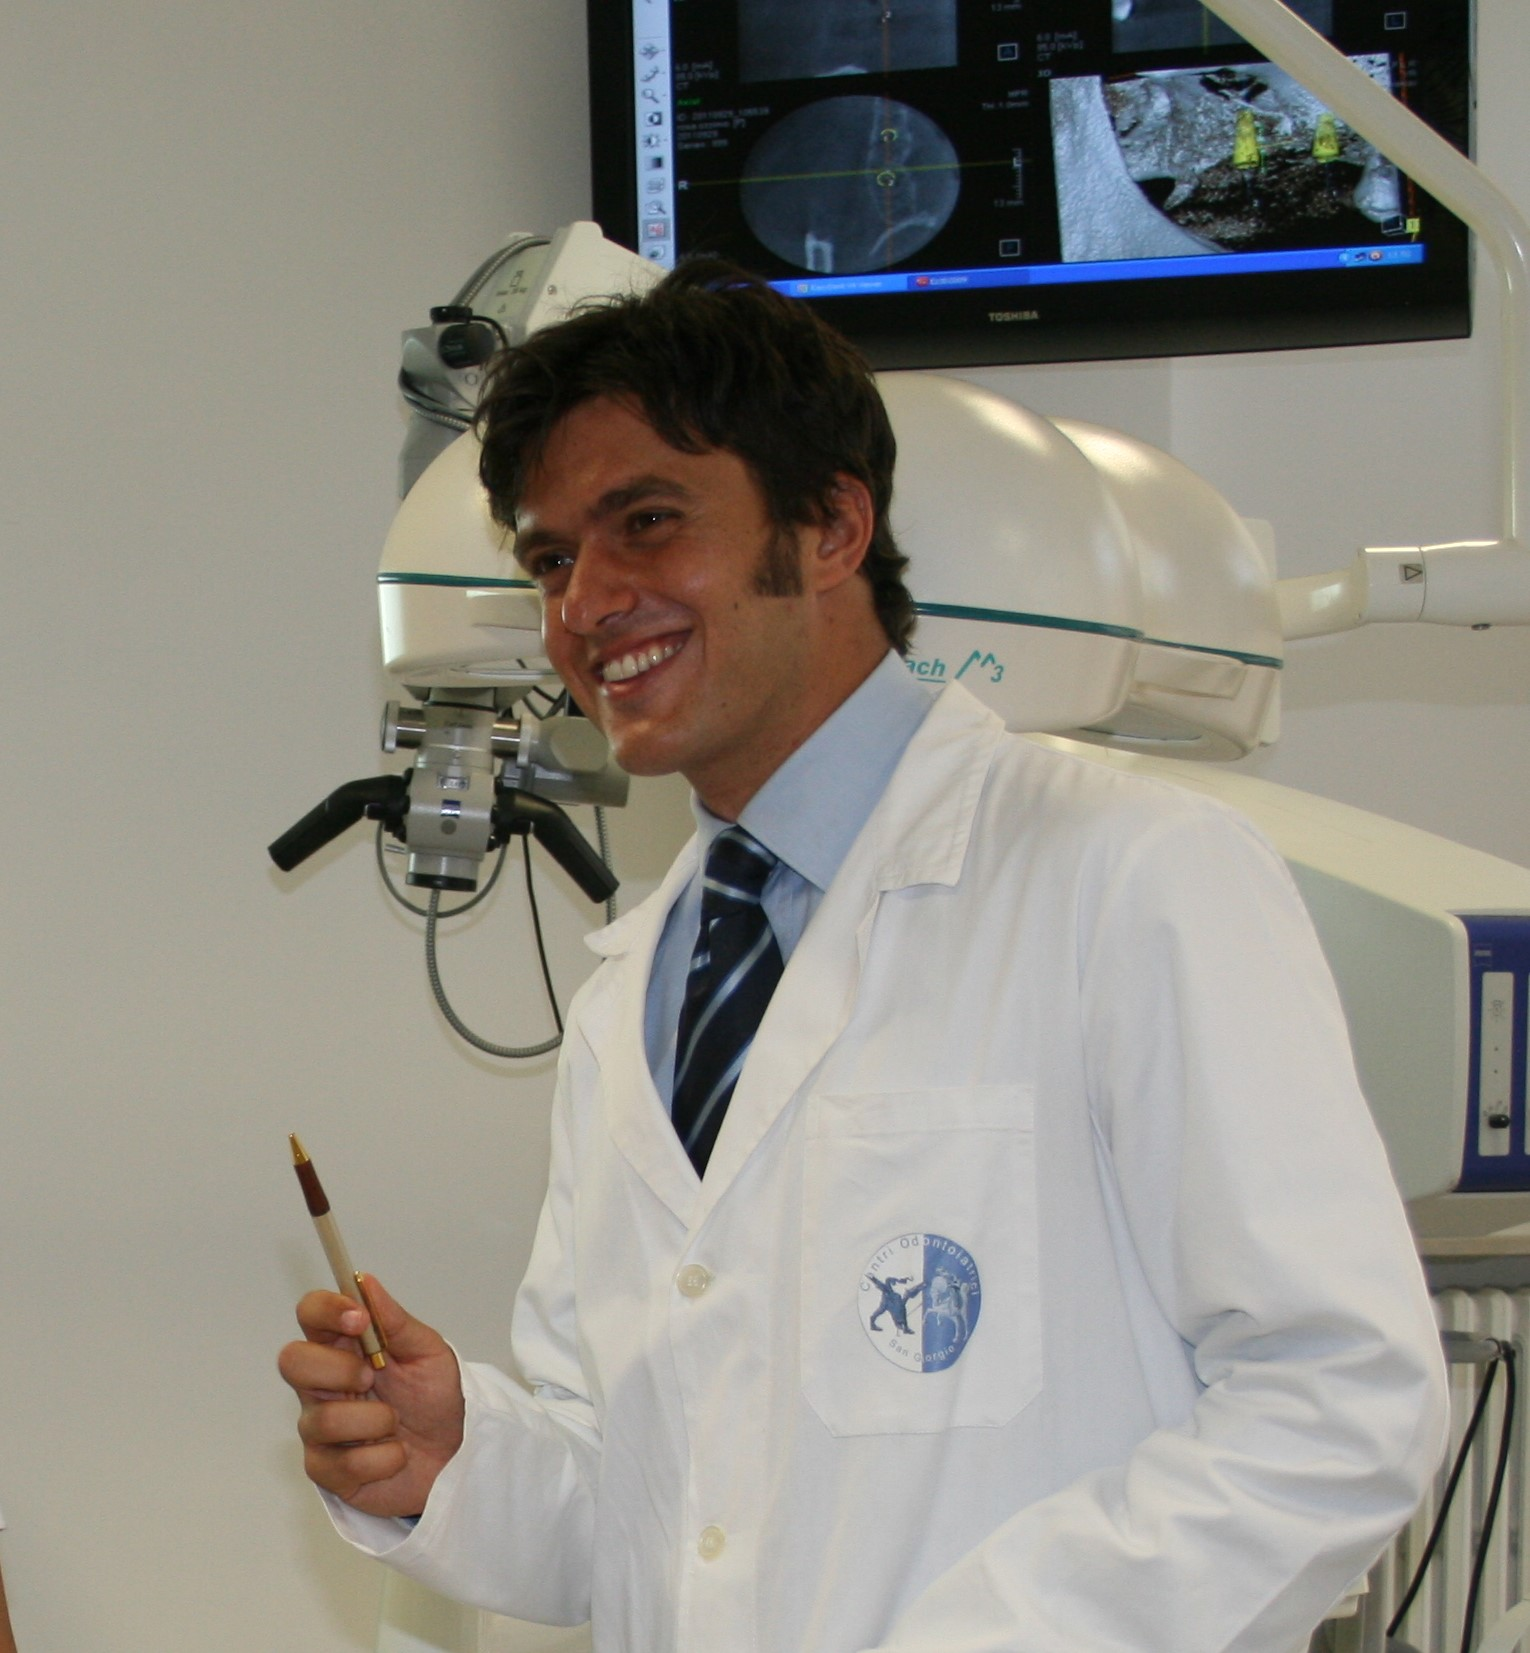 Dr. Eugenio Cilento